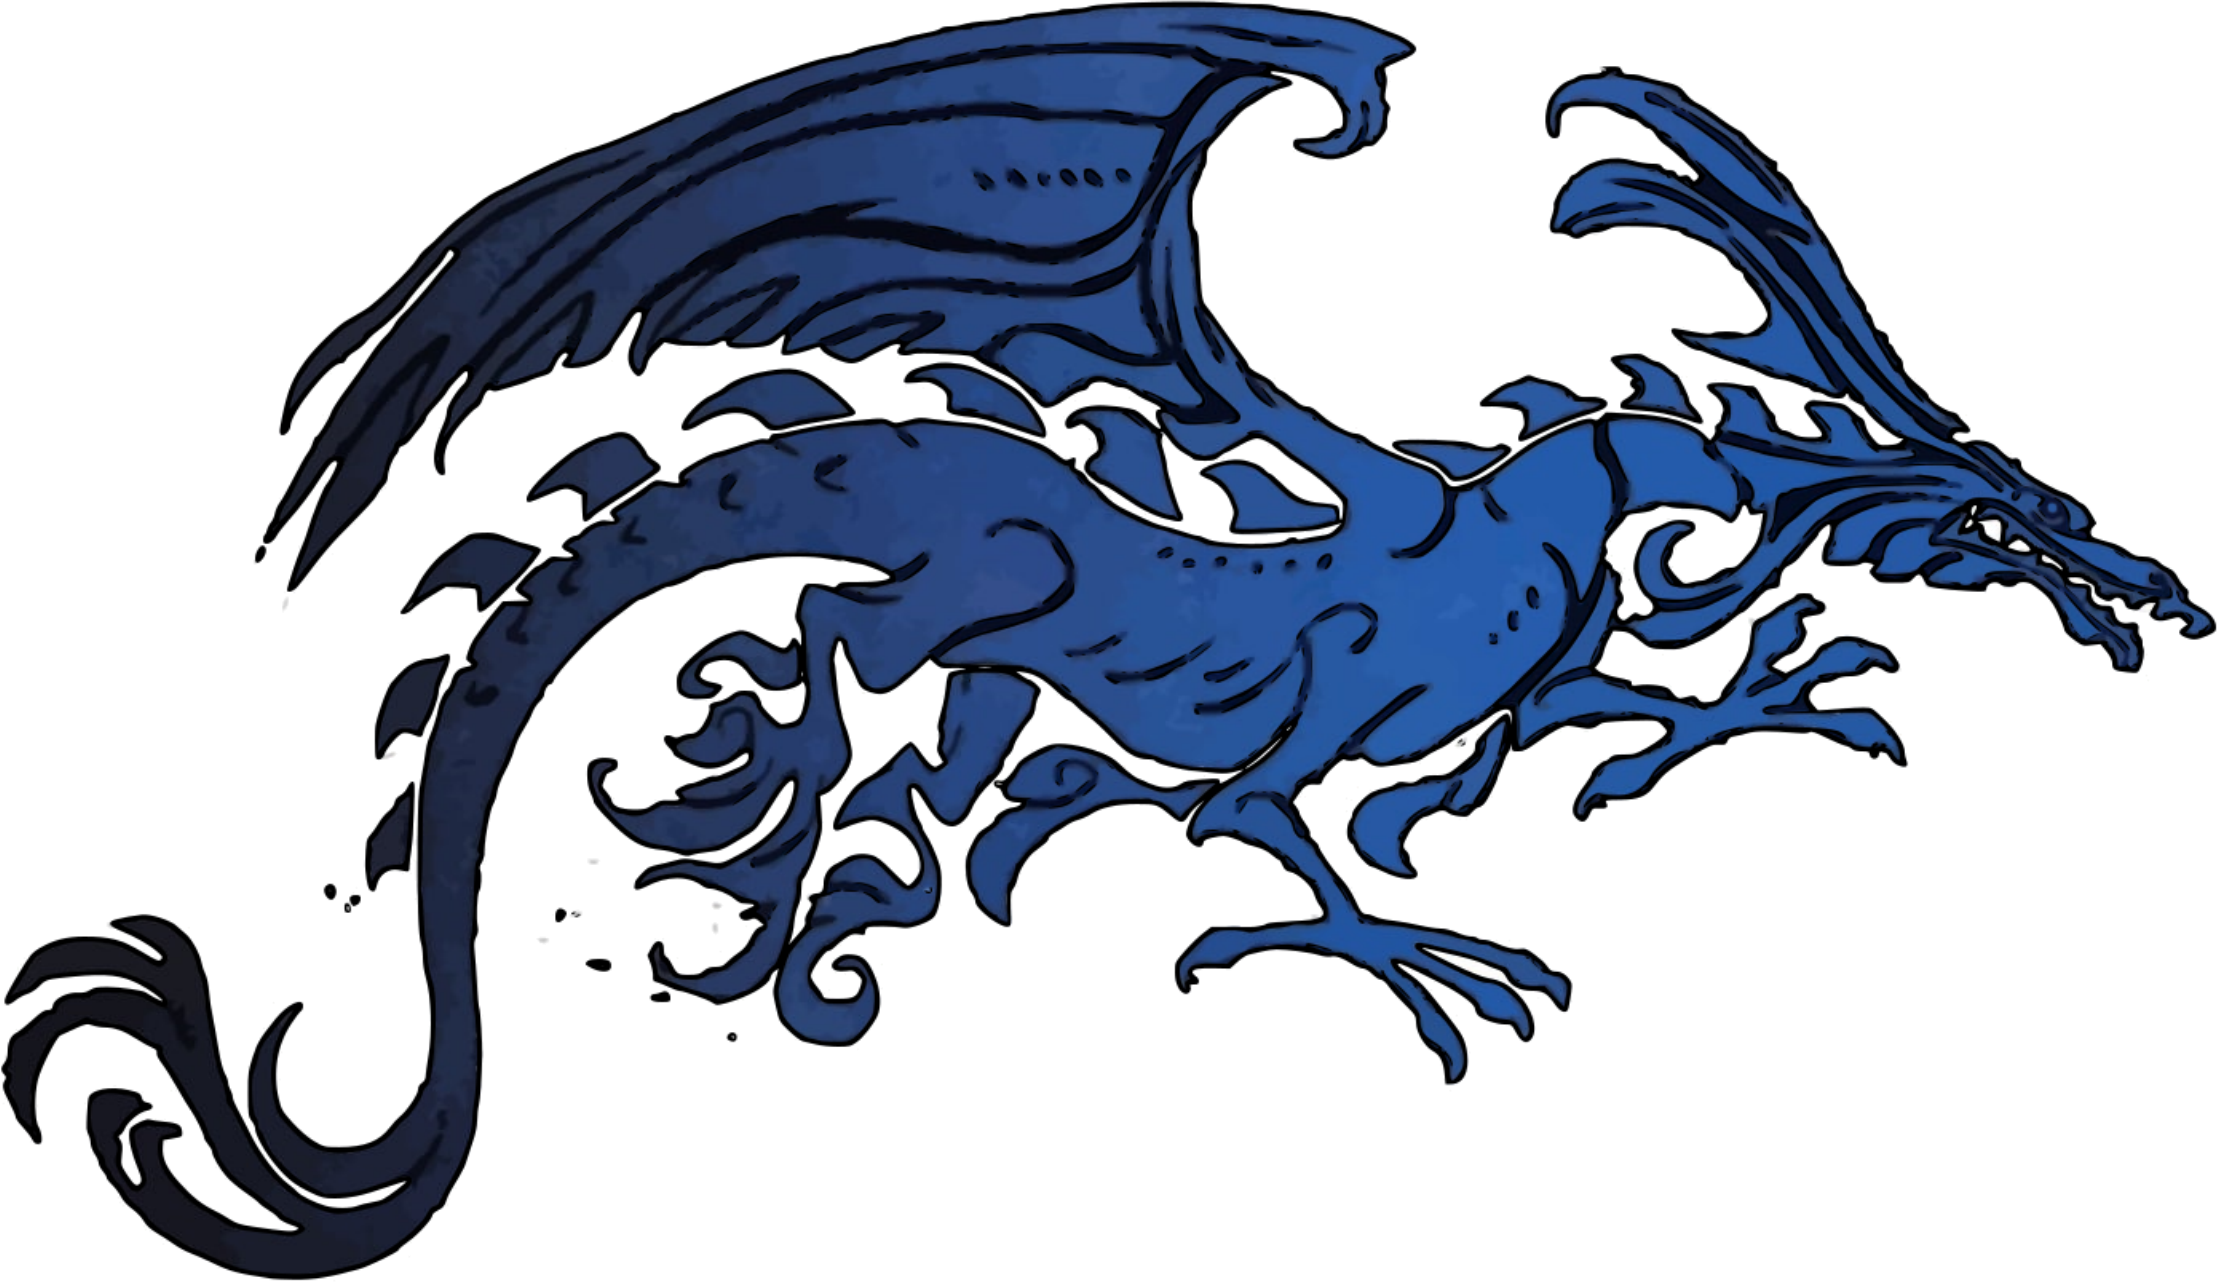 Dragon clipart fierce dragon. Black and blue tribal